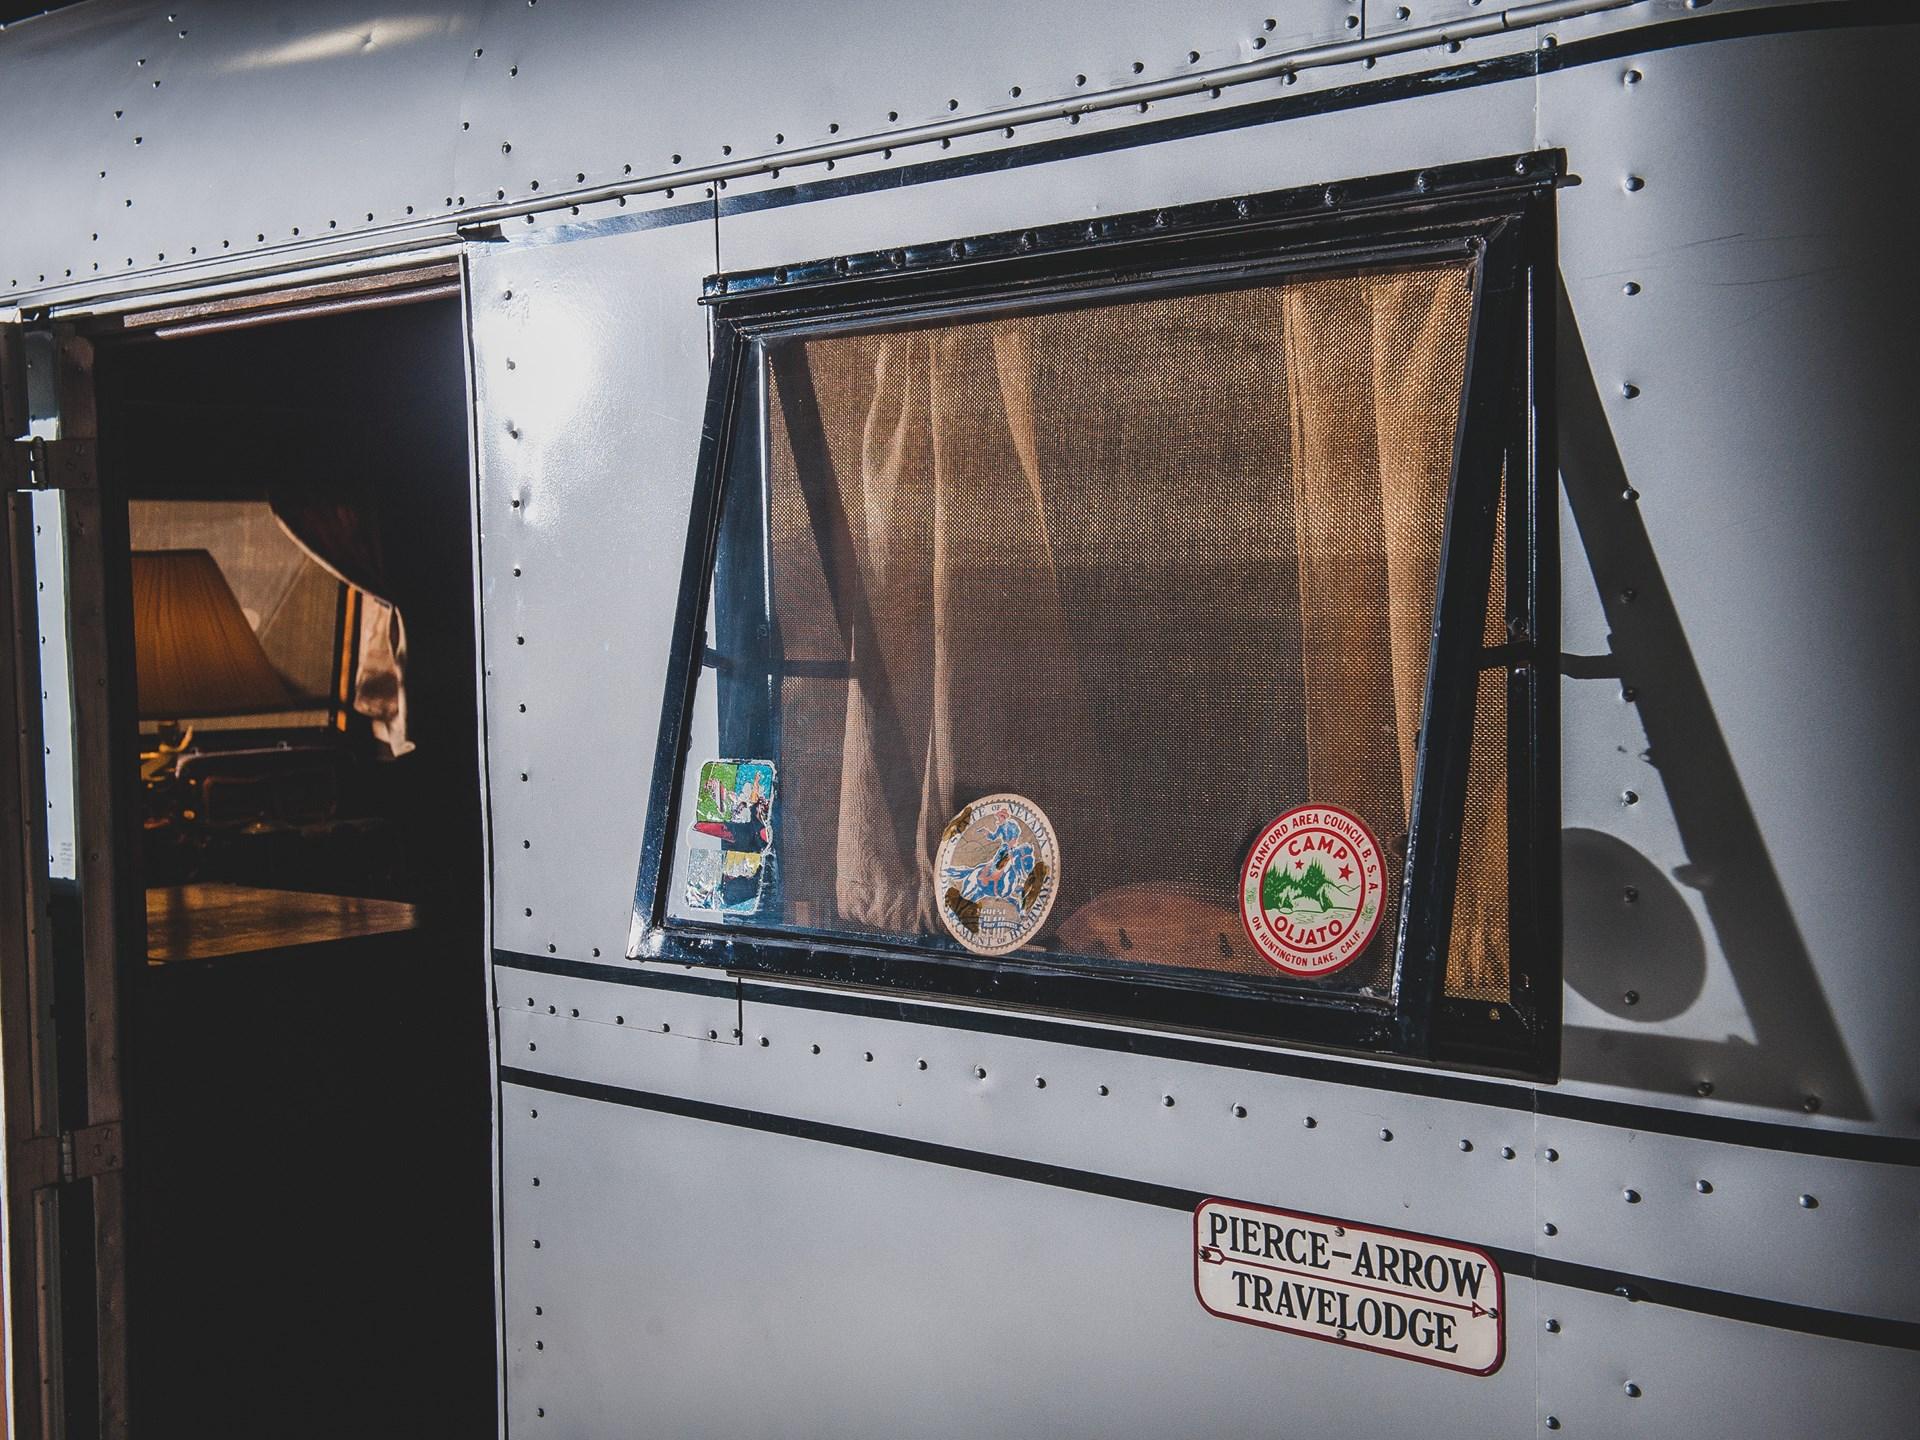 1937 Pierce-Arrow Model C Travelodge window